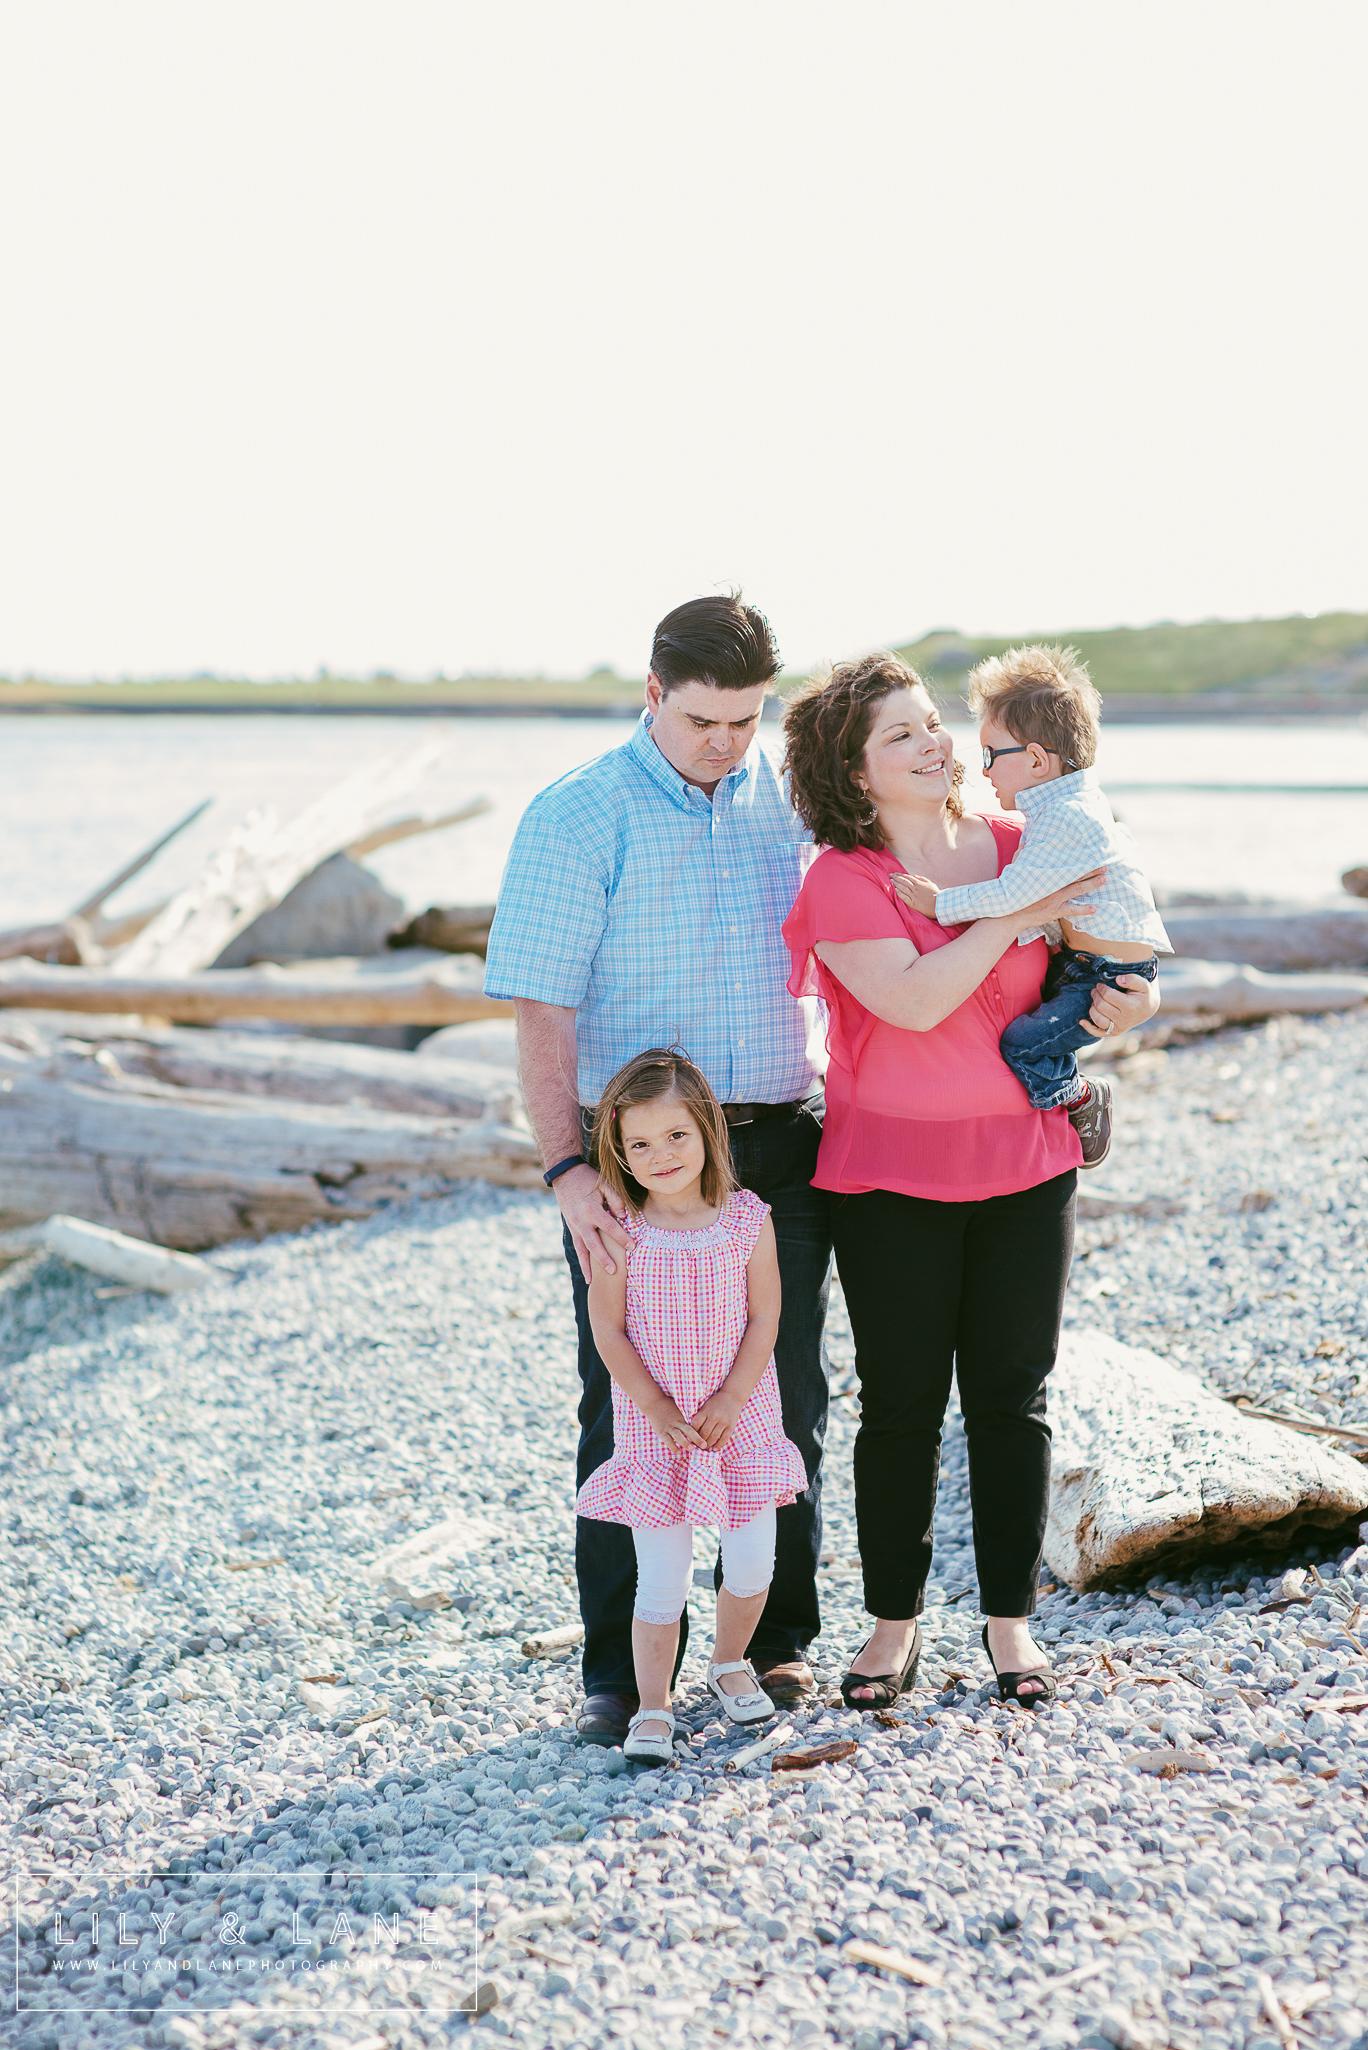 Nicola_Reiersen_Family_Photographer_Victoria_BC_Beach_Session.jpg